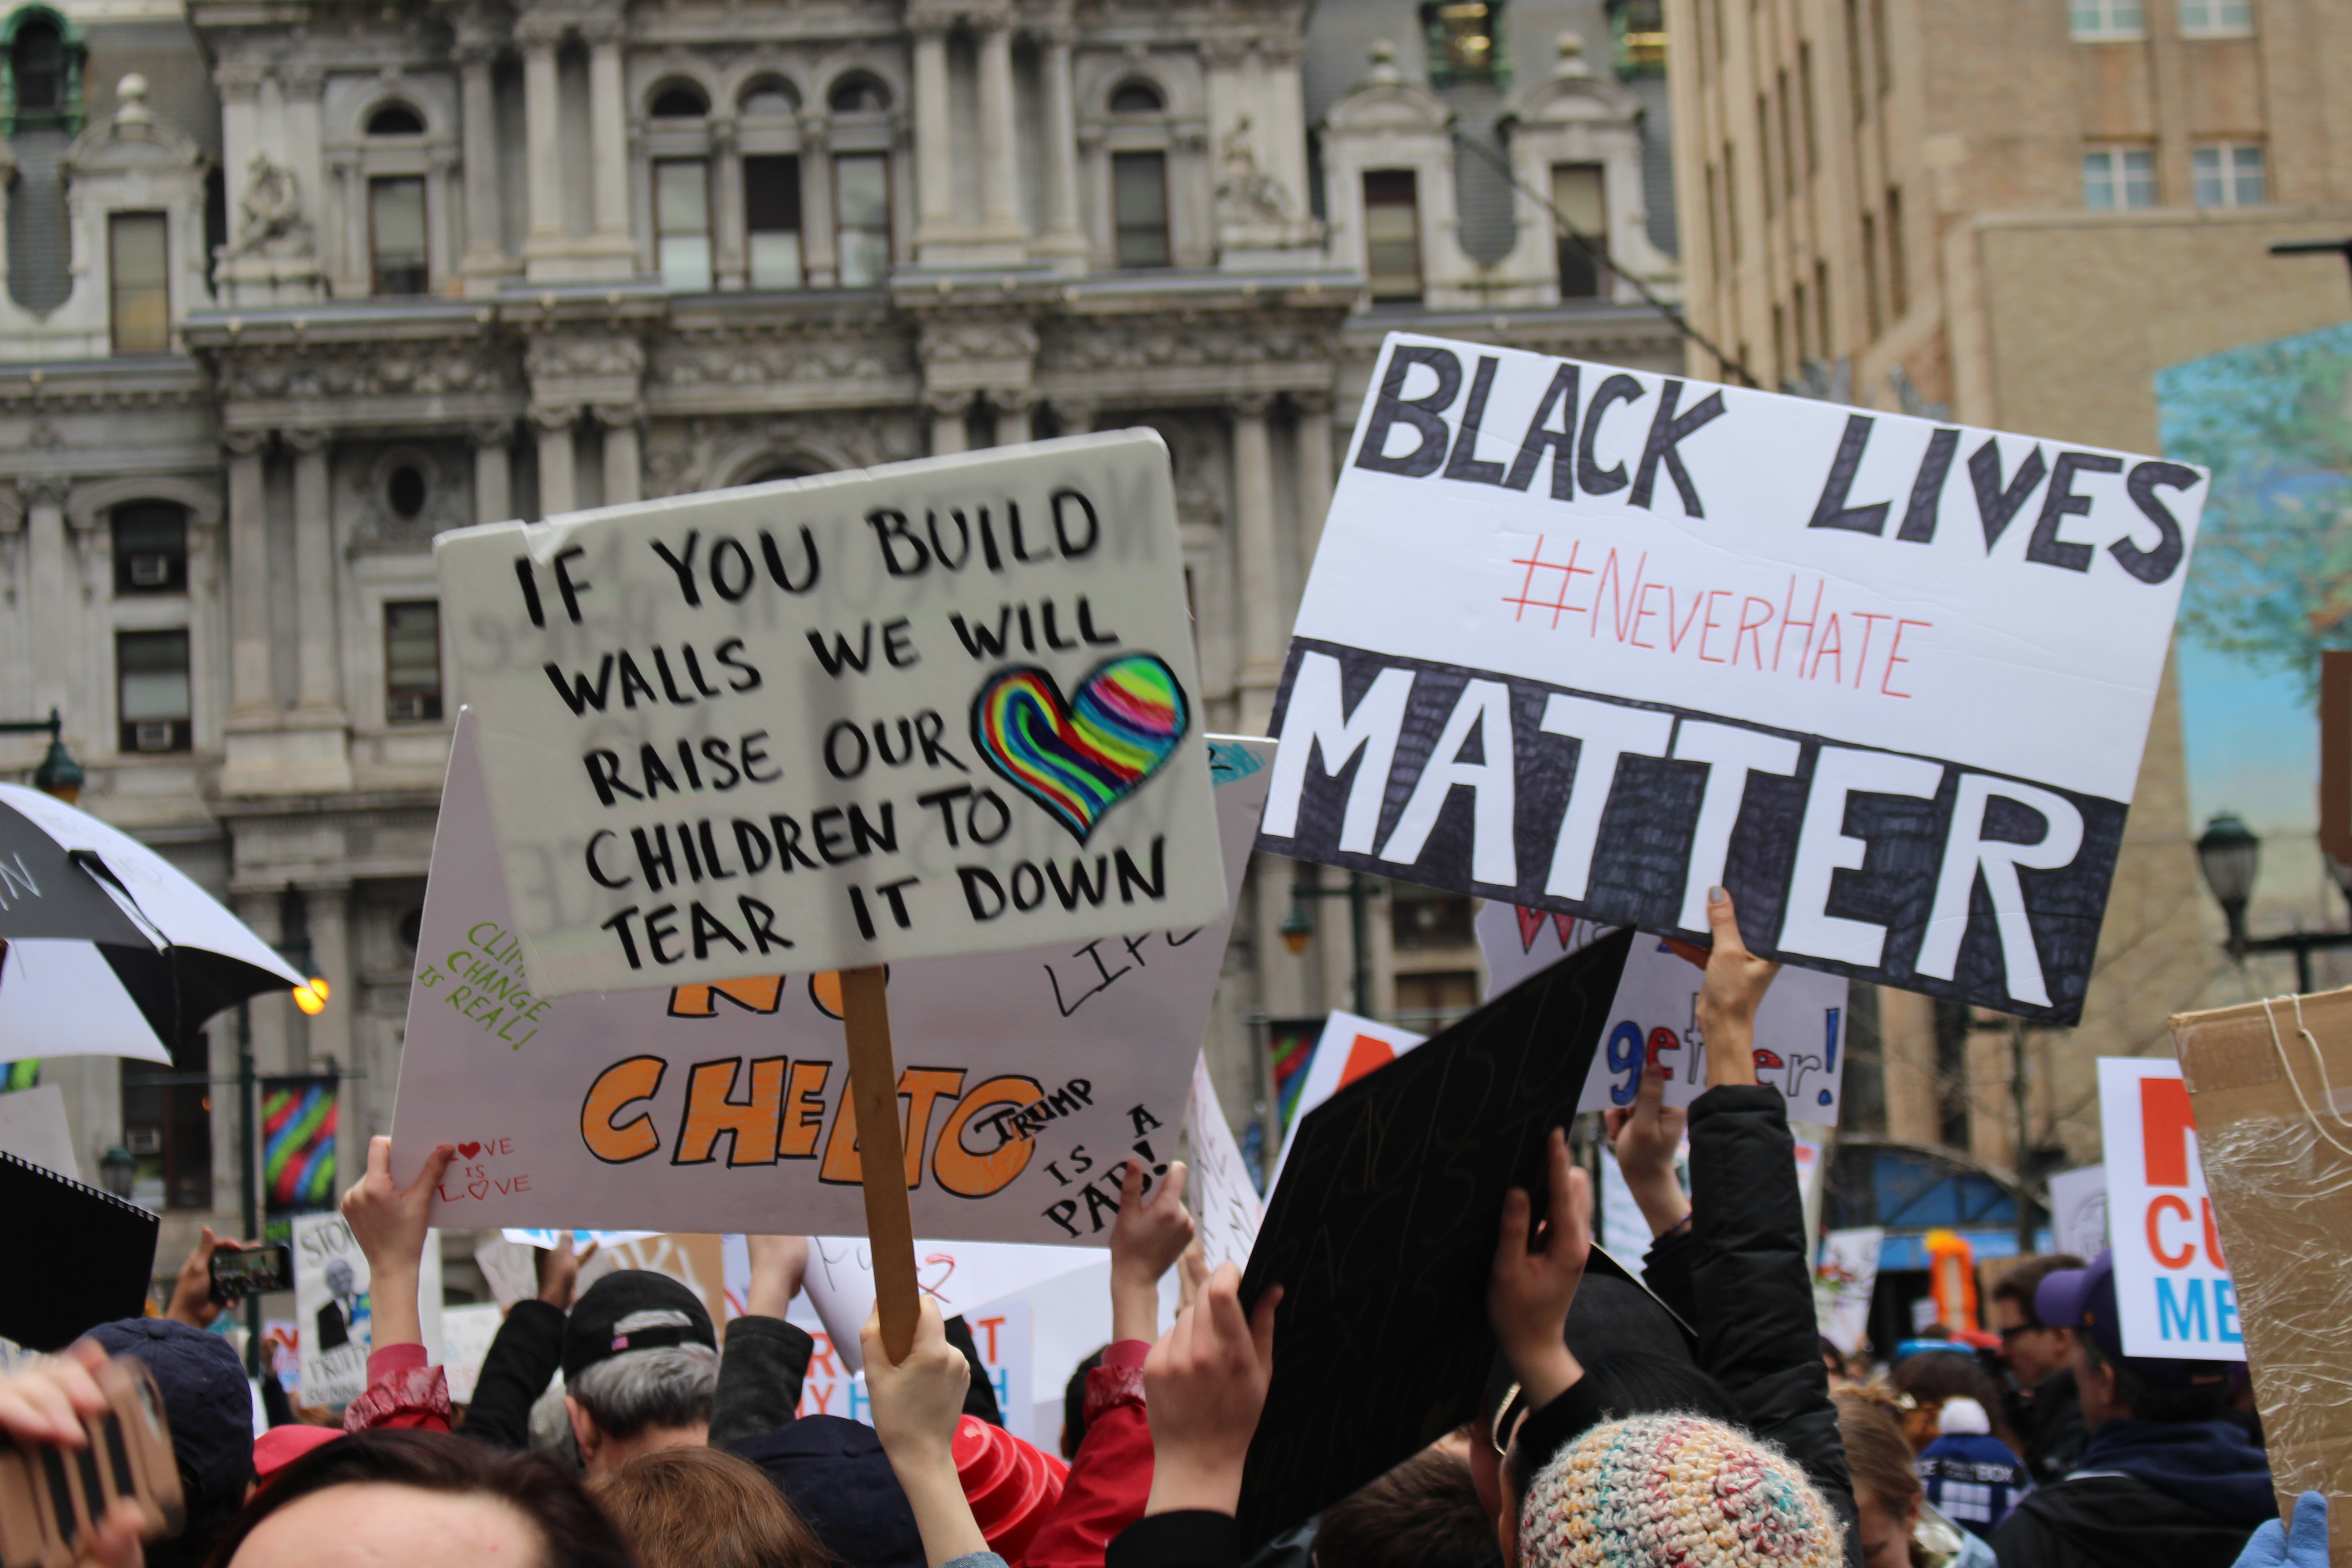 Protest in January 2017 in Philadelphia. Photo: Yesid Vargas /AL DÍA News